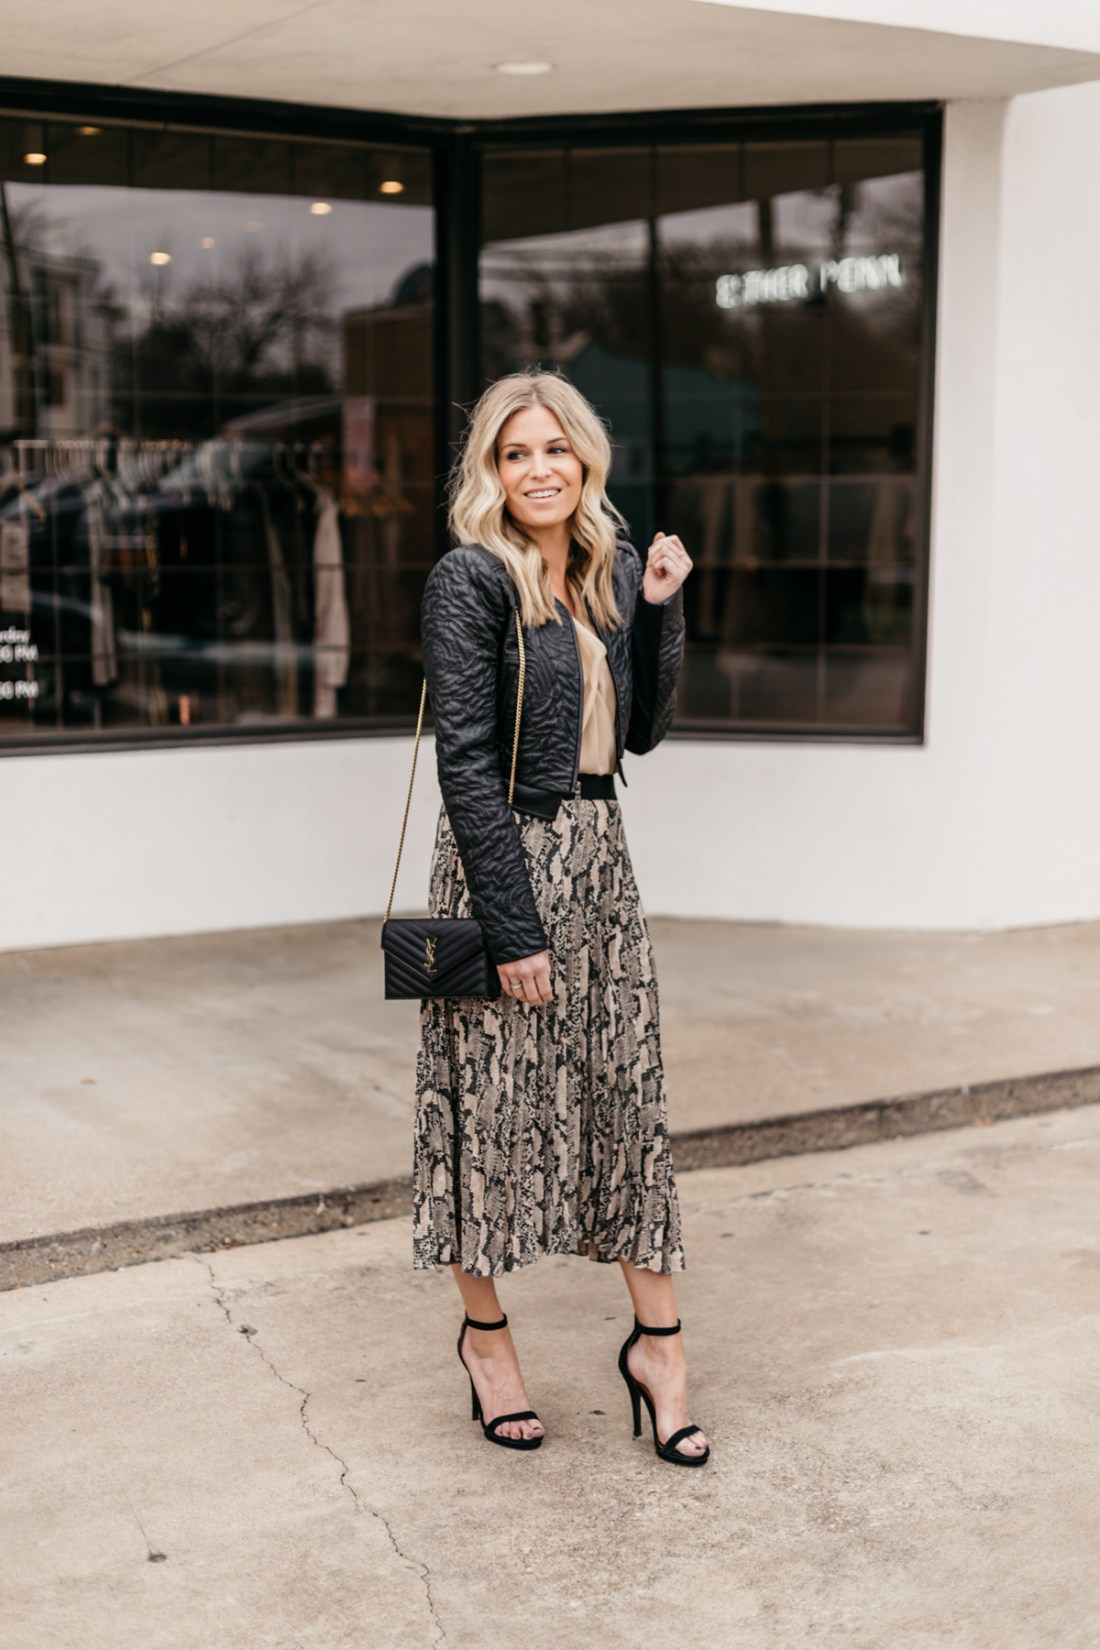 Leopard Skirt// Twist Top // Leather Jacket // Black Pumps